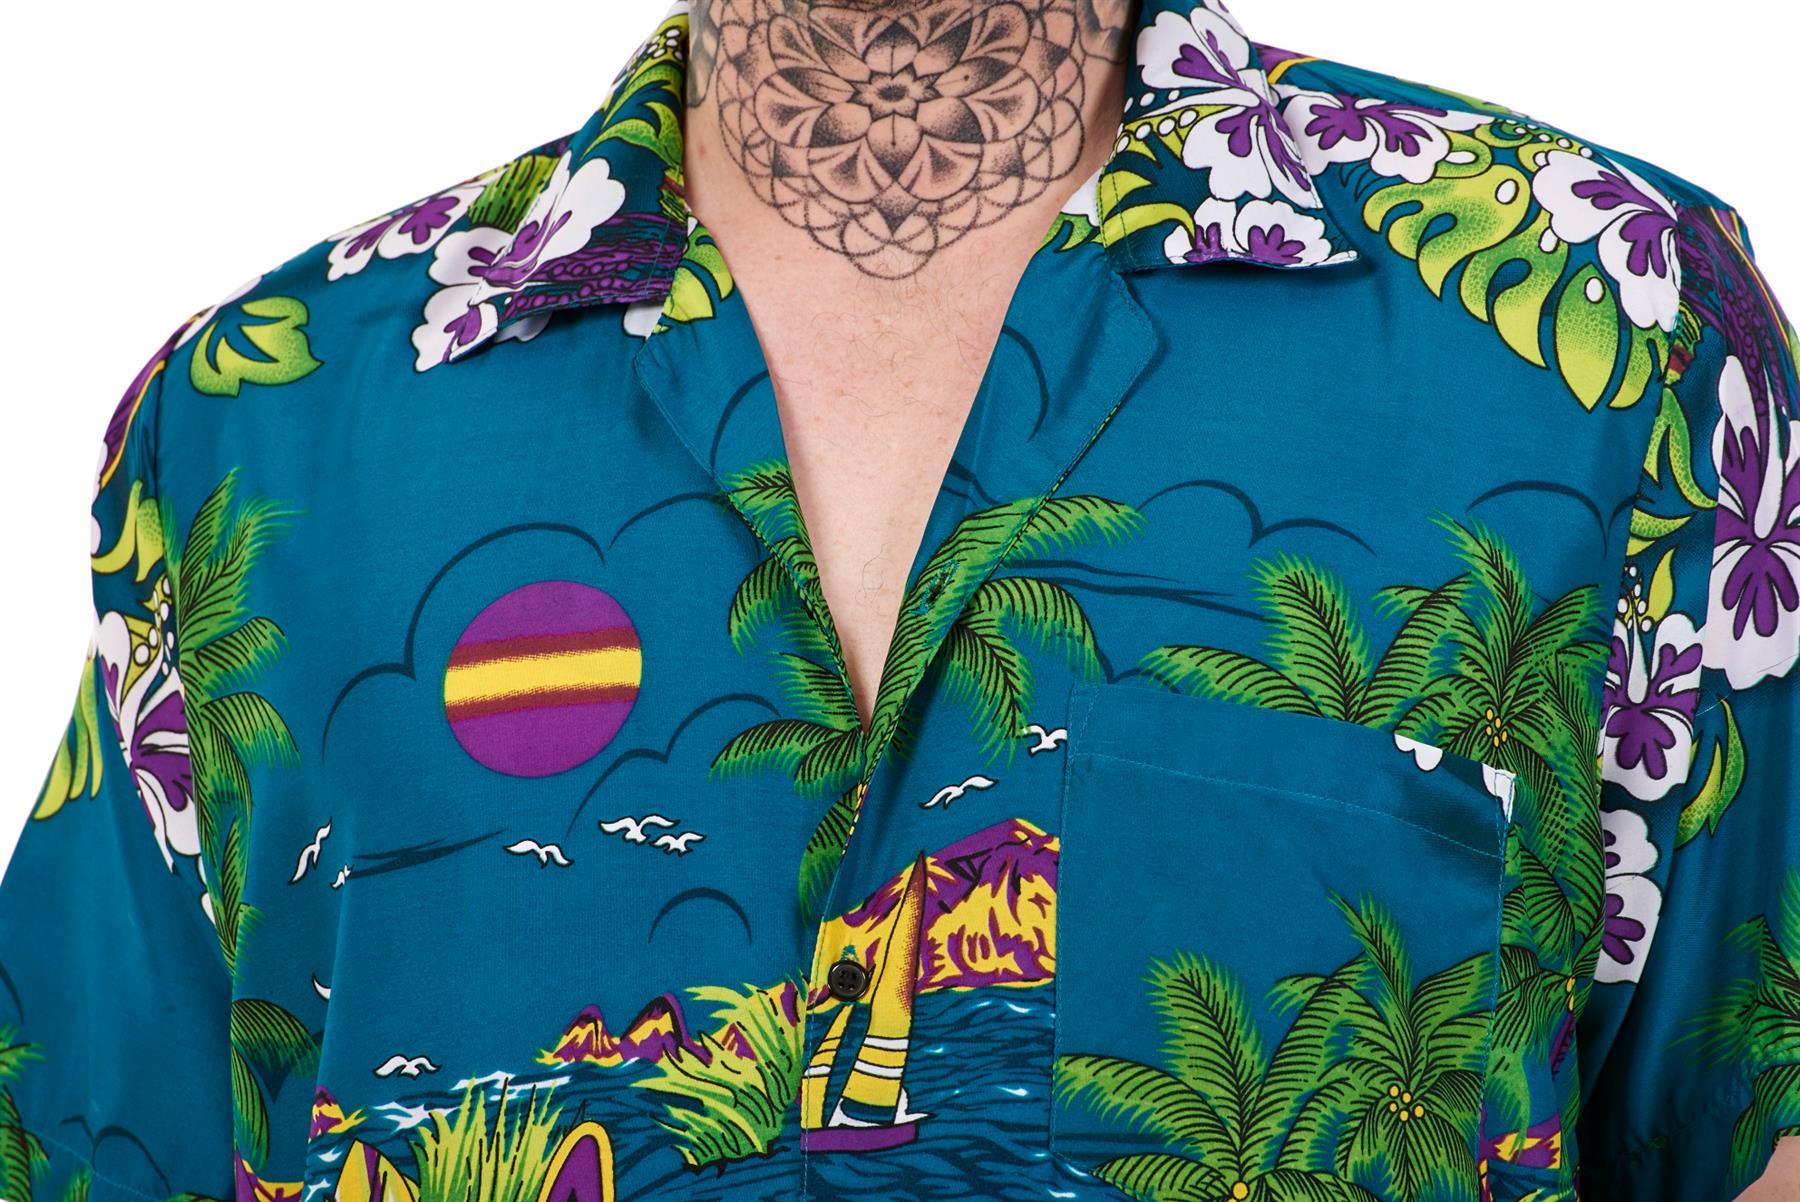 Mens-Hawaiian-Shirt-Multi-Colors-Print-Regular-Big-Size-Summer-Fancy-Dress-M-5XL thumbnail 11